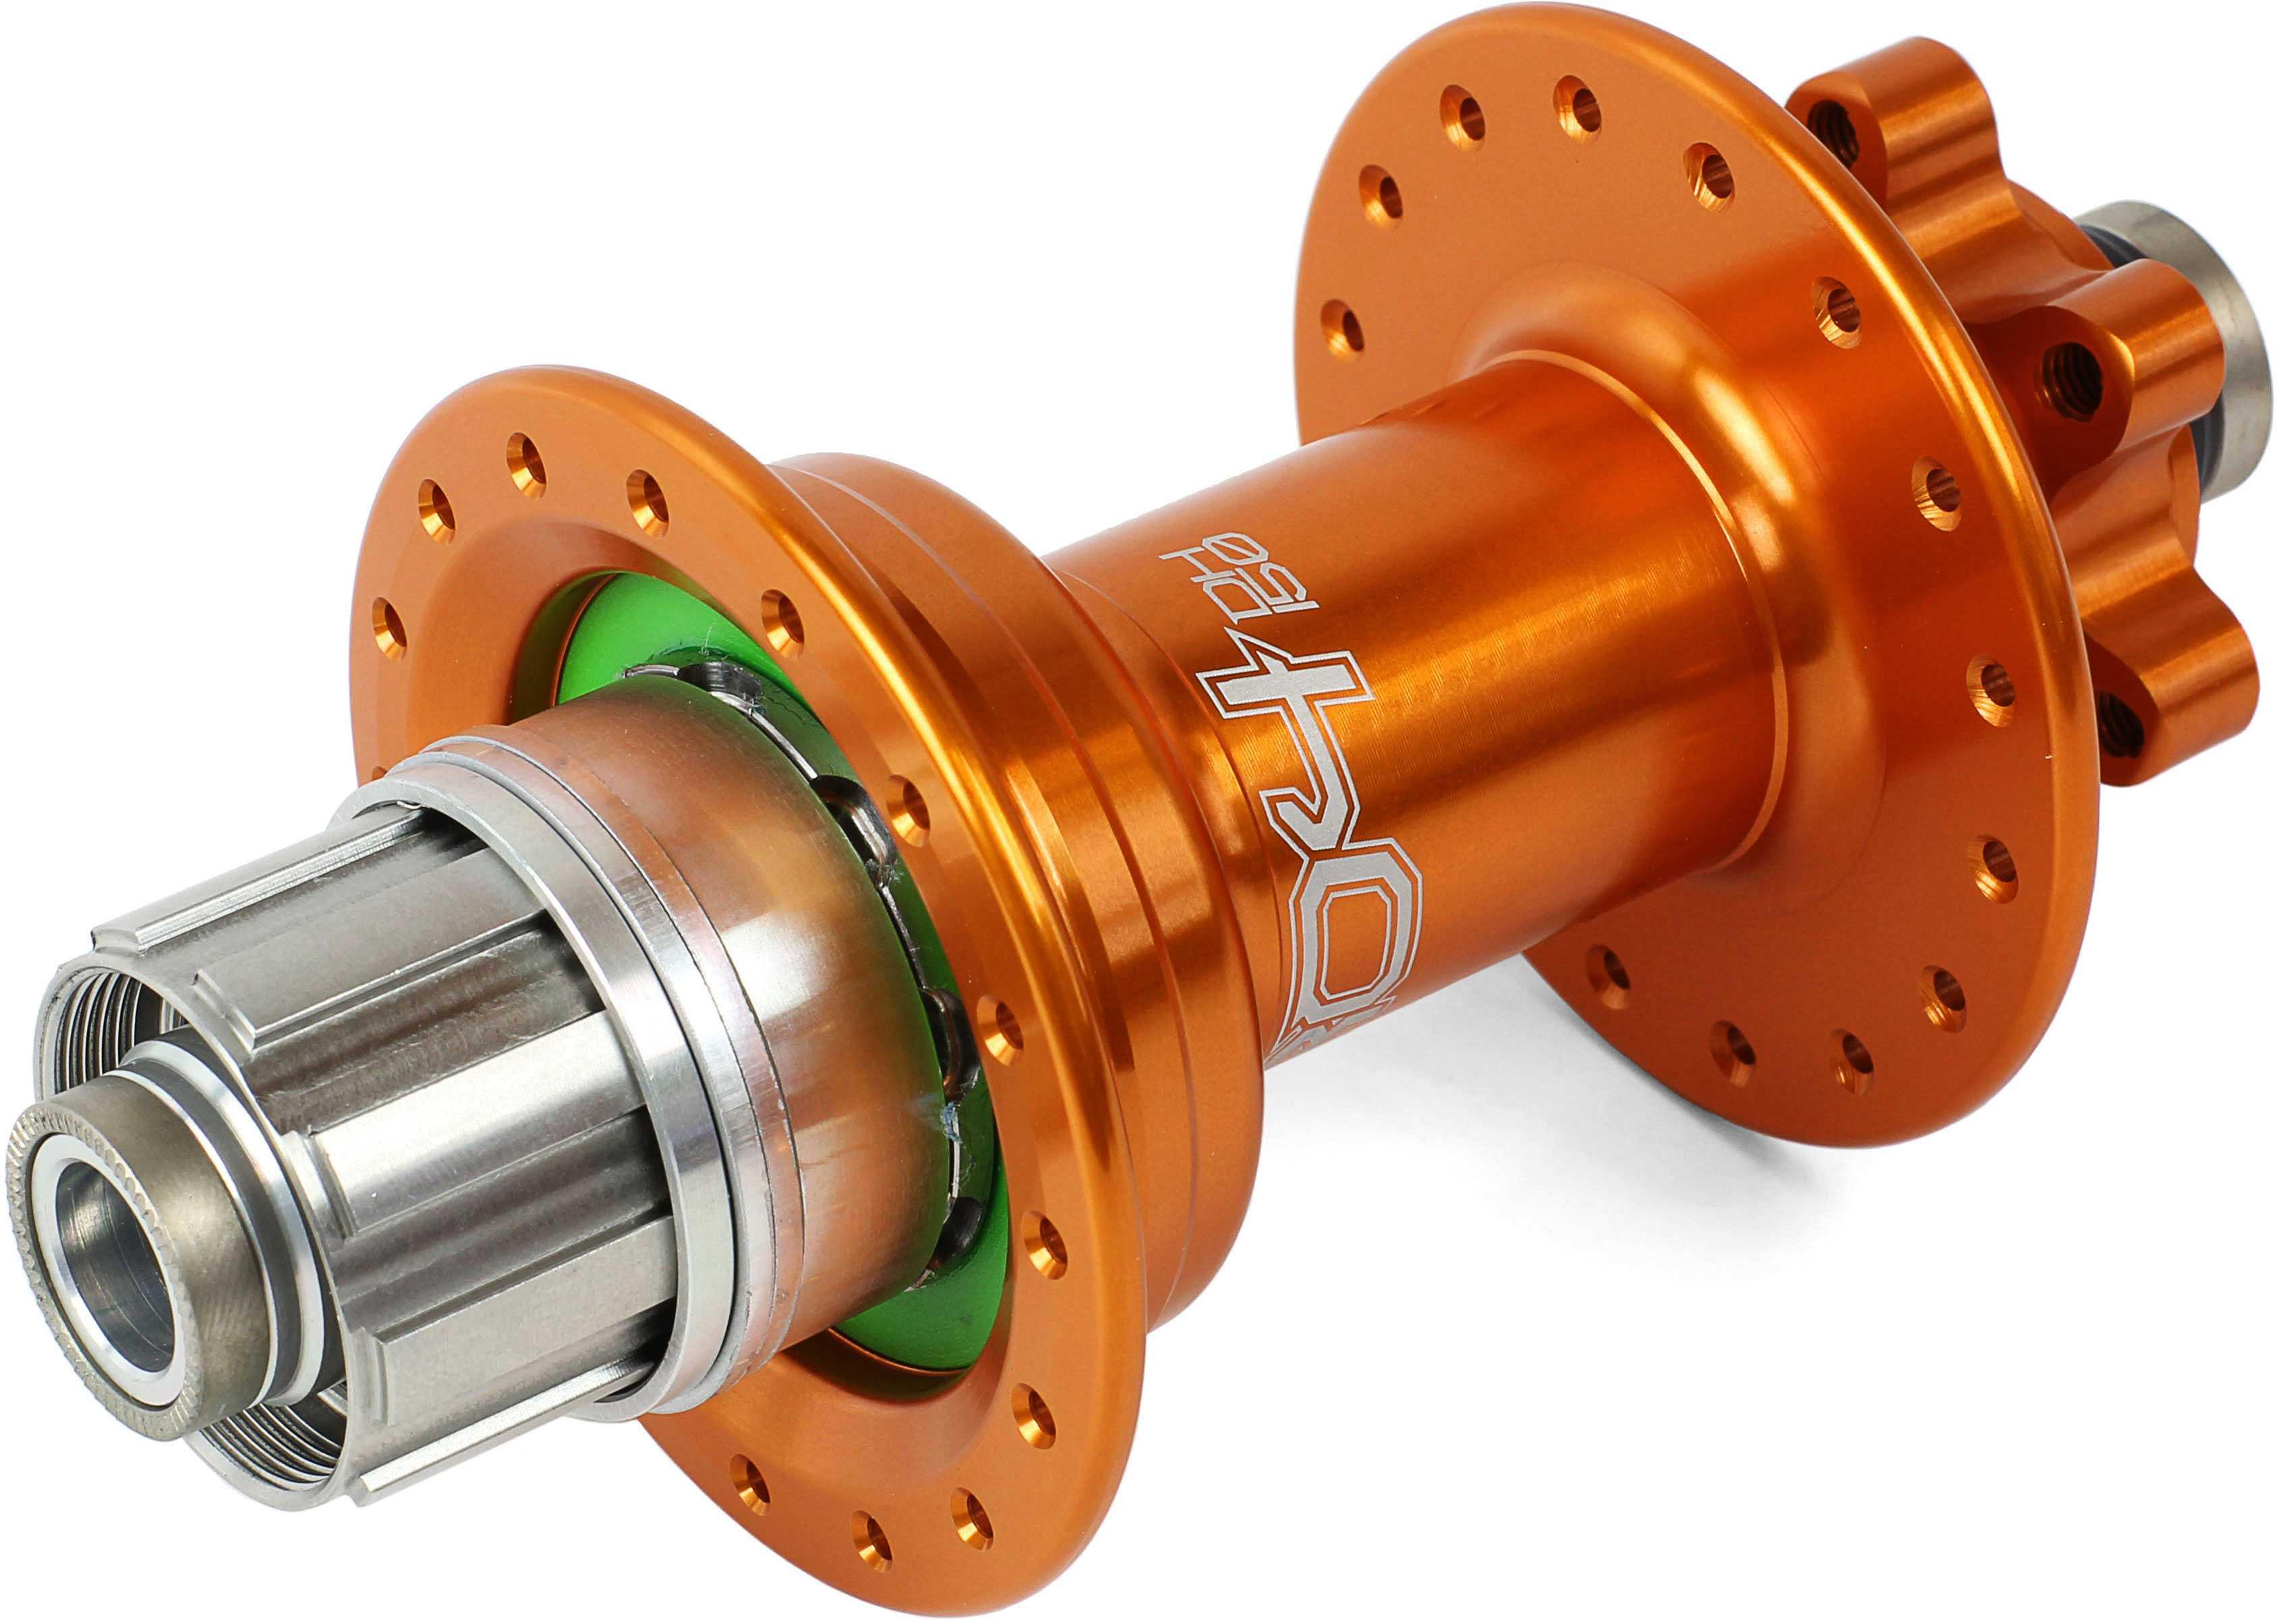 Bagnav Hope Pro 4 DH IS 32H 12 x 150 mm Shimano/SRAM stål orange | Hubs